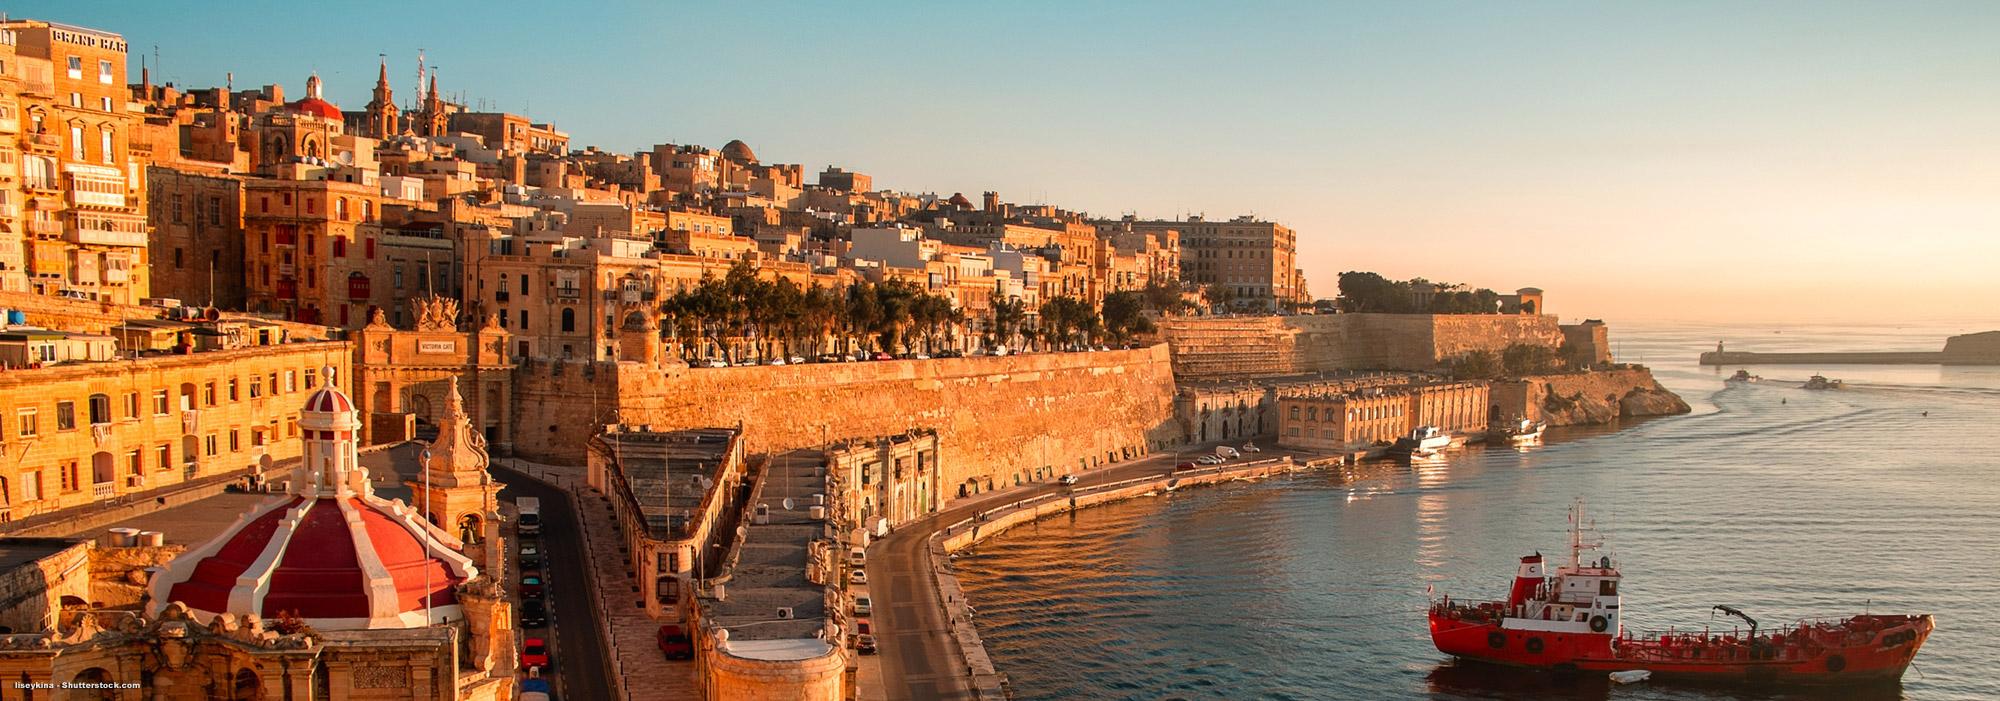 Sprachschulen Malta Hauptinsel, Sprachkurse Malta Hauptinsel